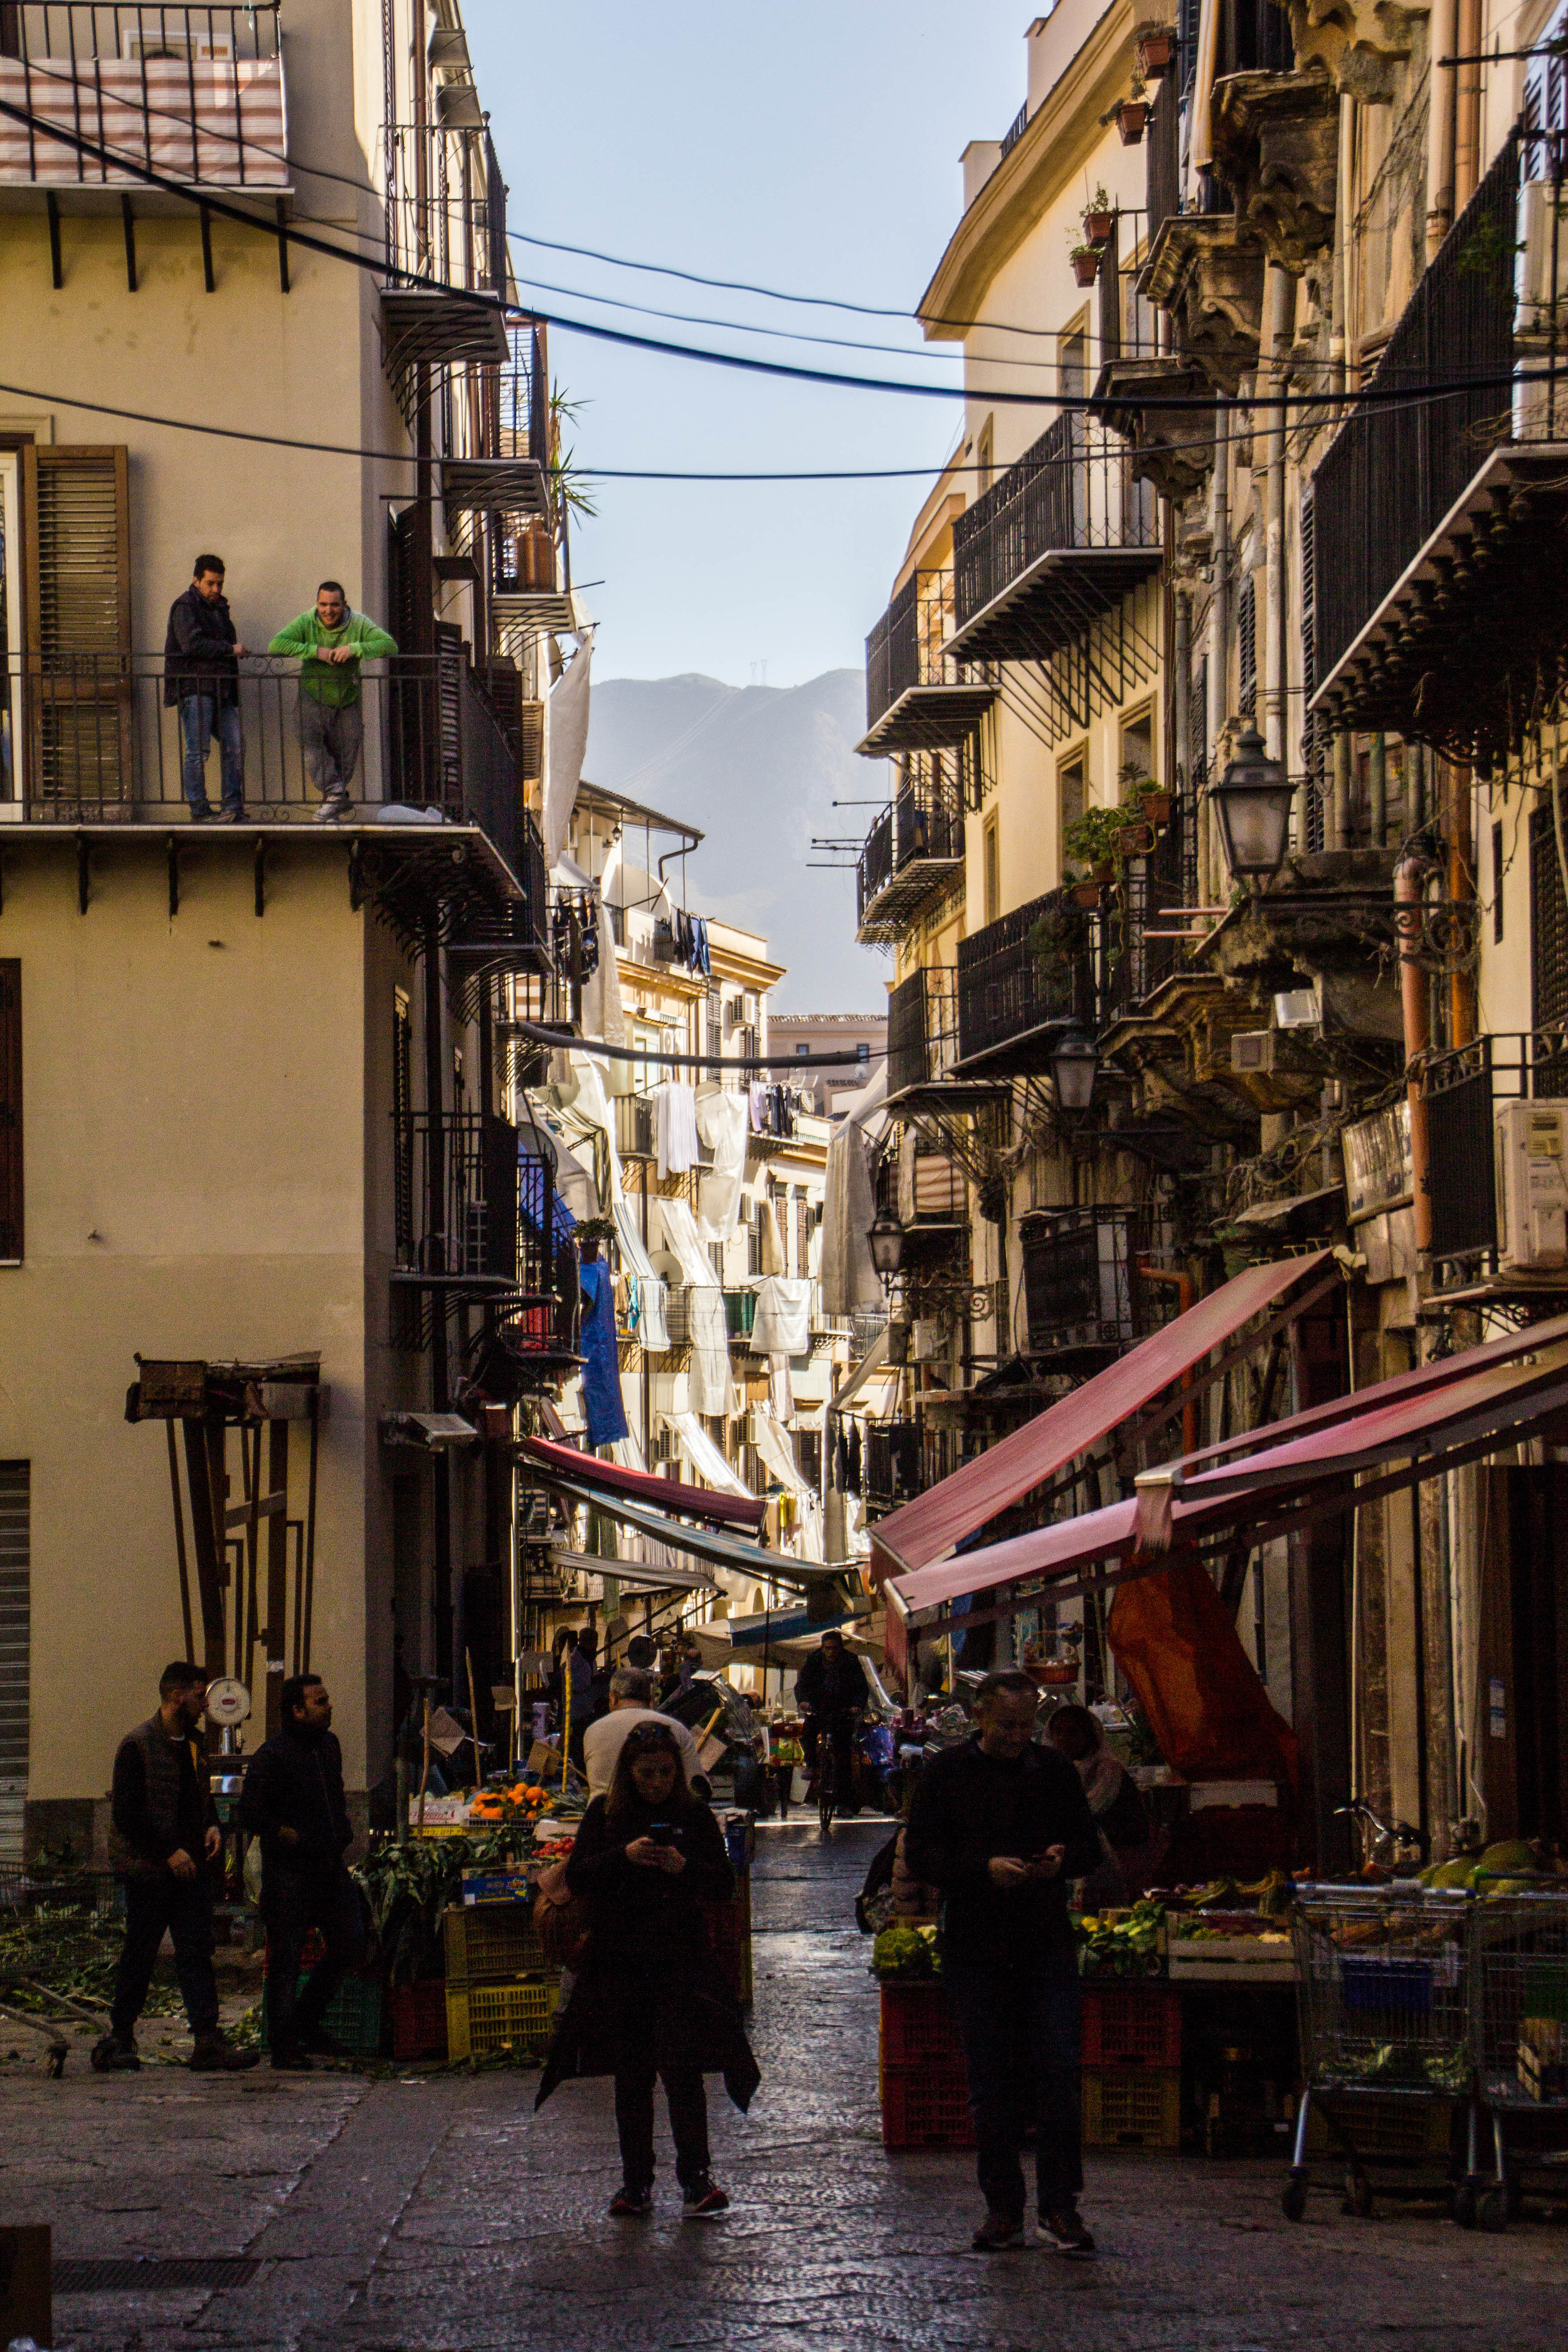 street-markets-palermo-sicily-18.jpg